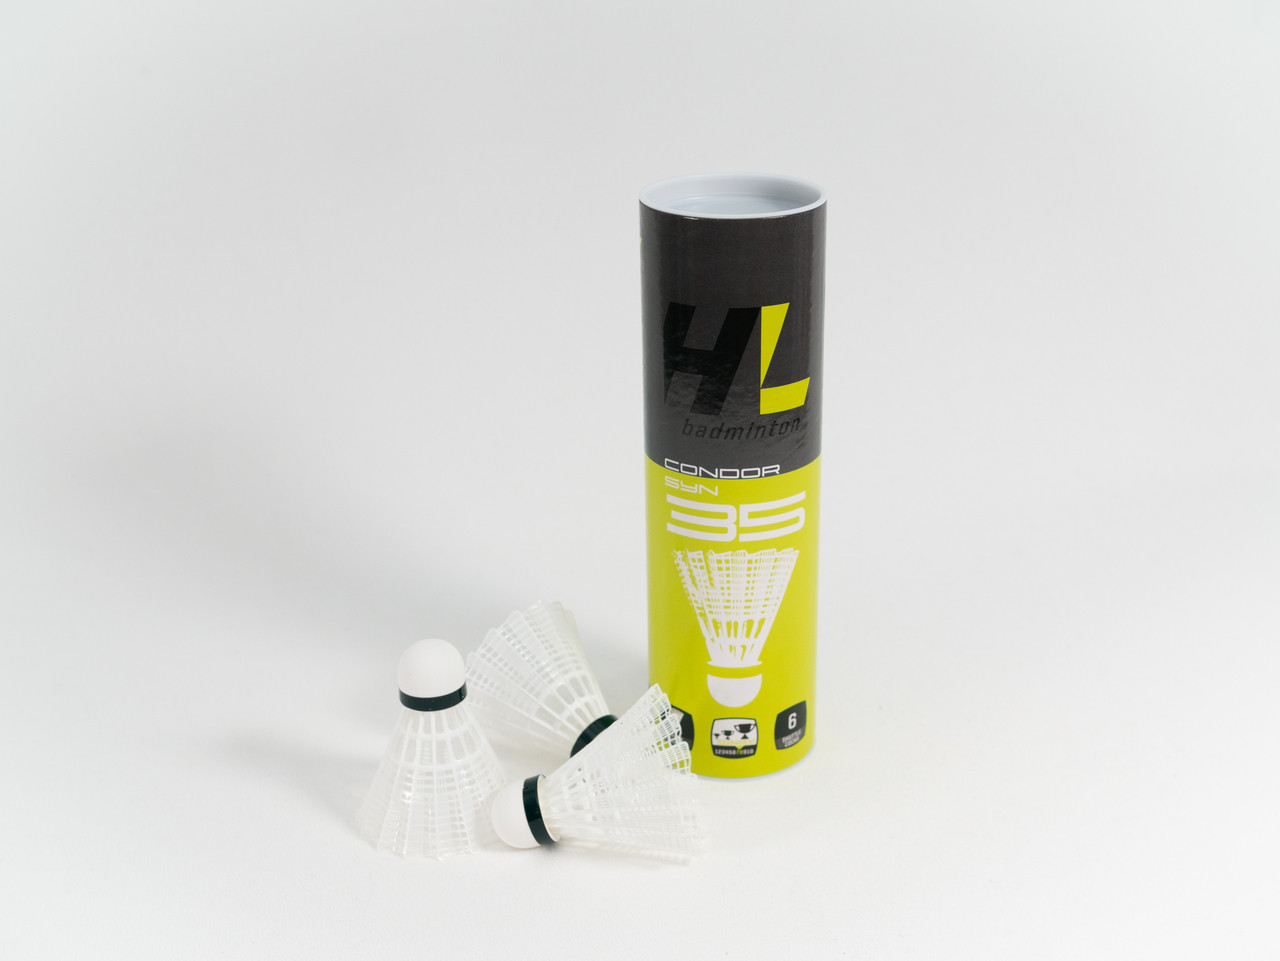 HL SYN 35 Condor Nylon/White